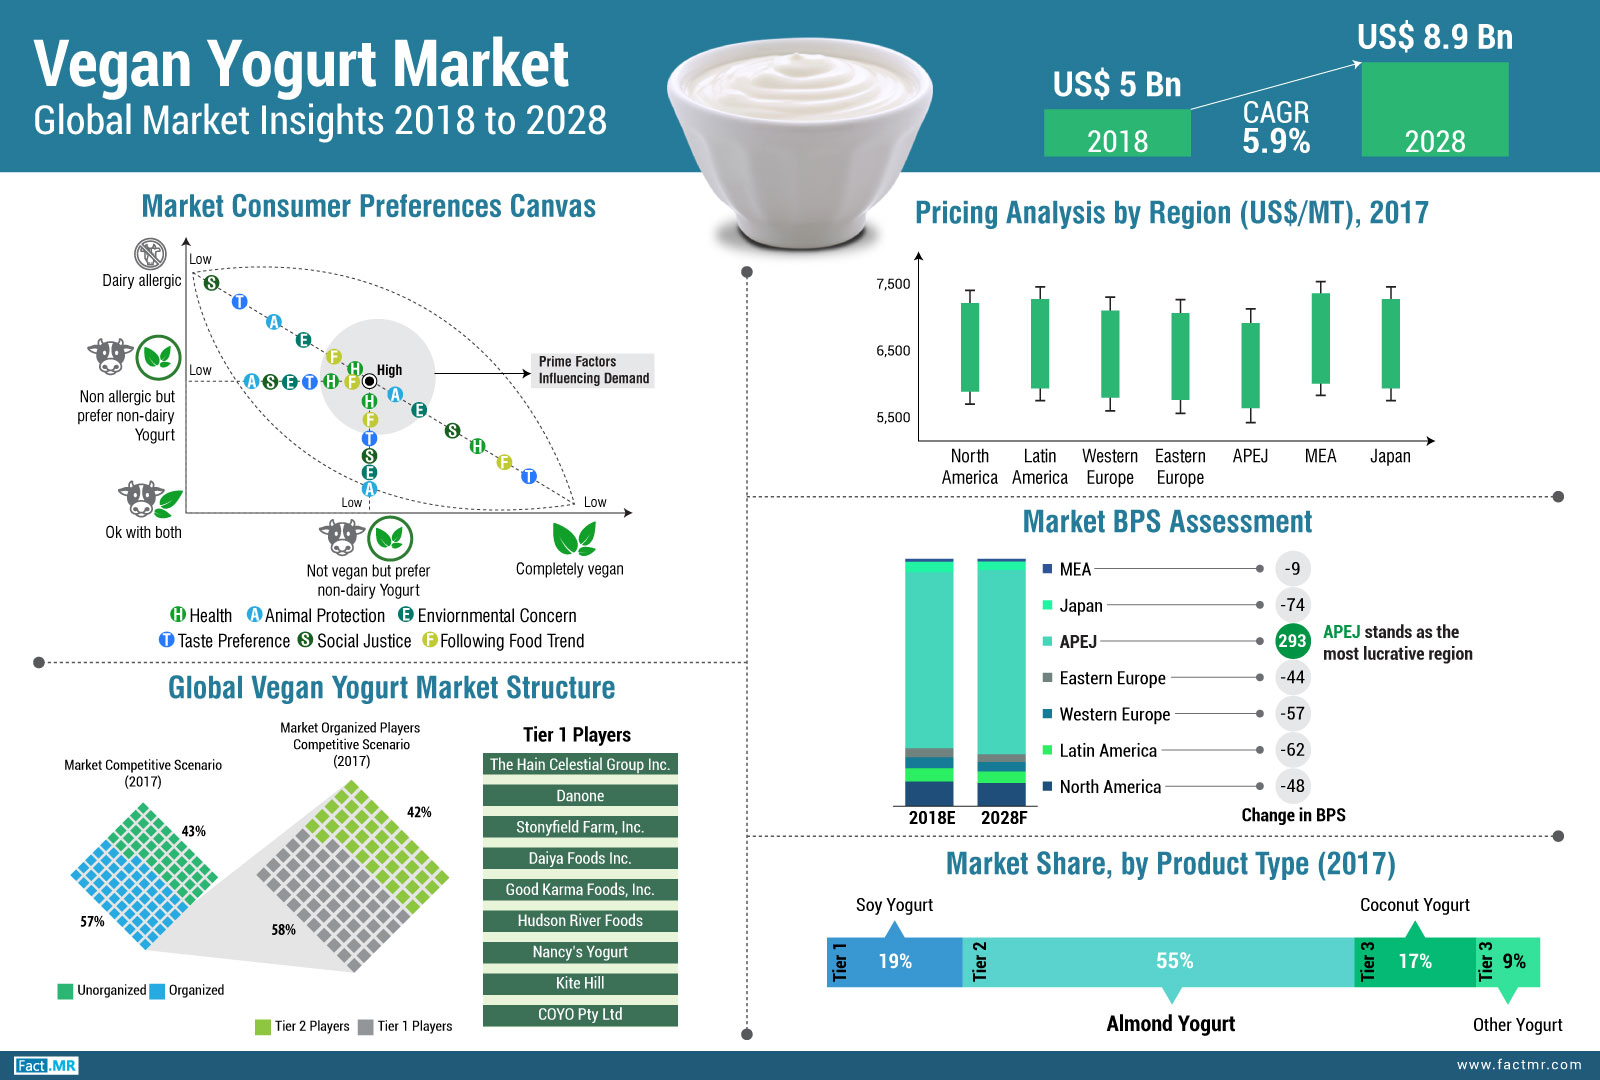 Vegan Yogurt Market Global Market Insights 2018 to 2028